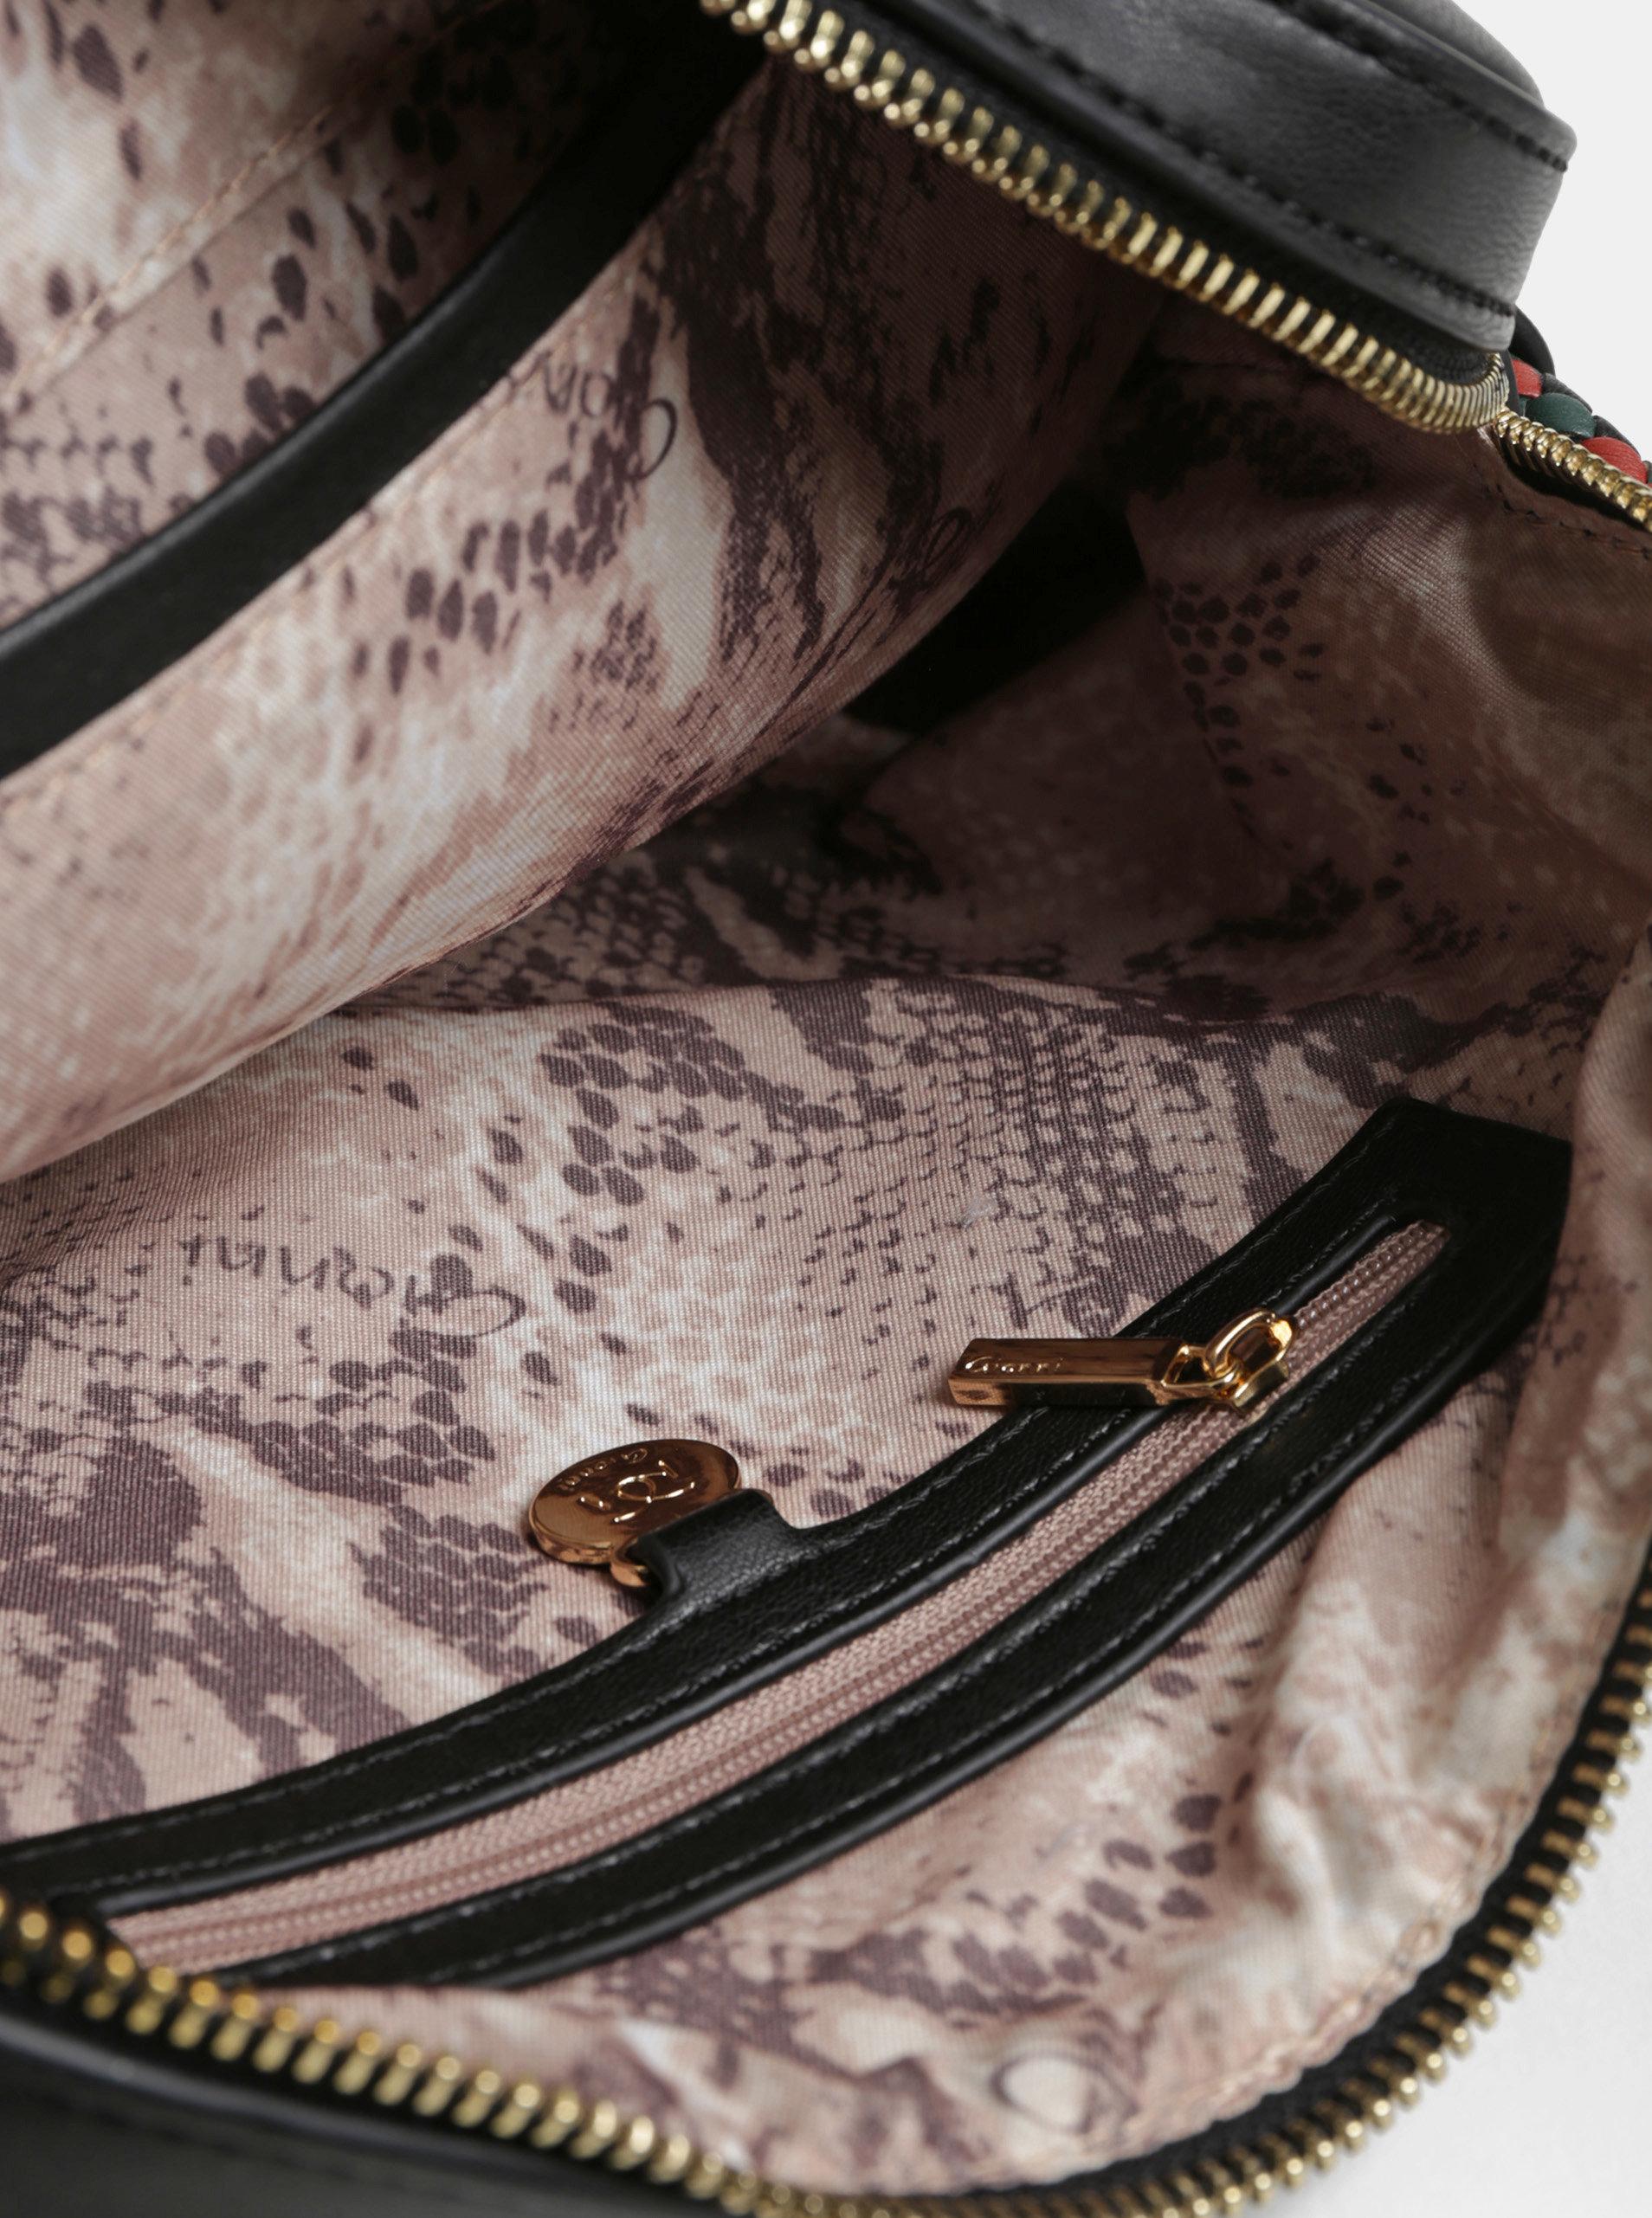 Čierna crossbody kabelka so strapcom Gionni Rosemarin ... 7011b8ff22d